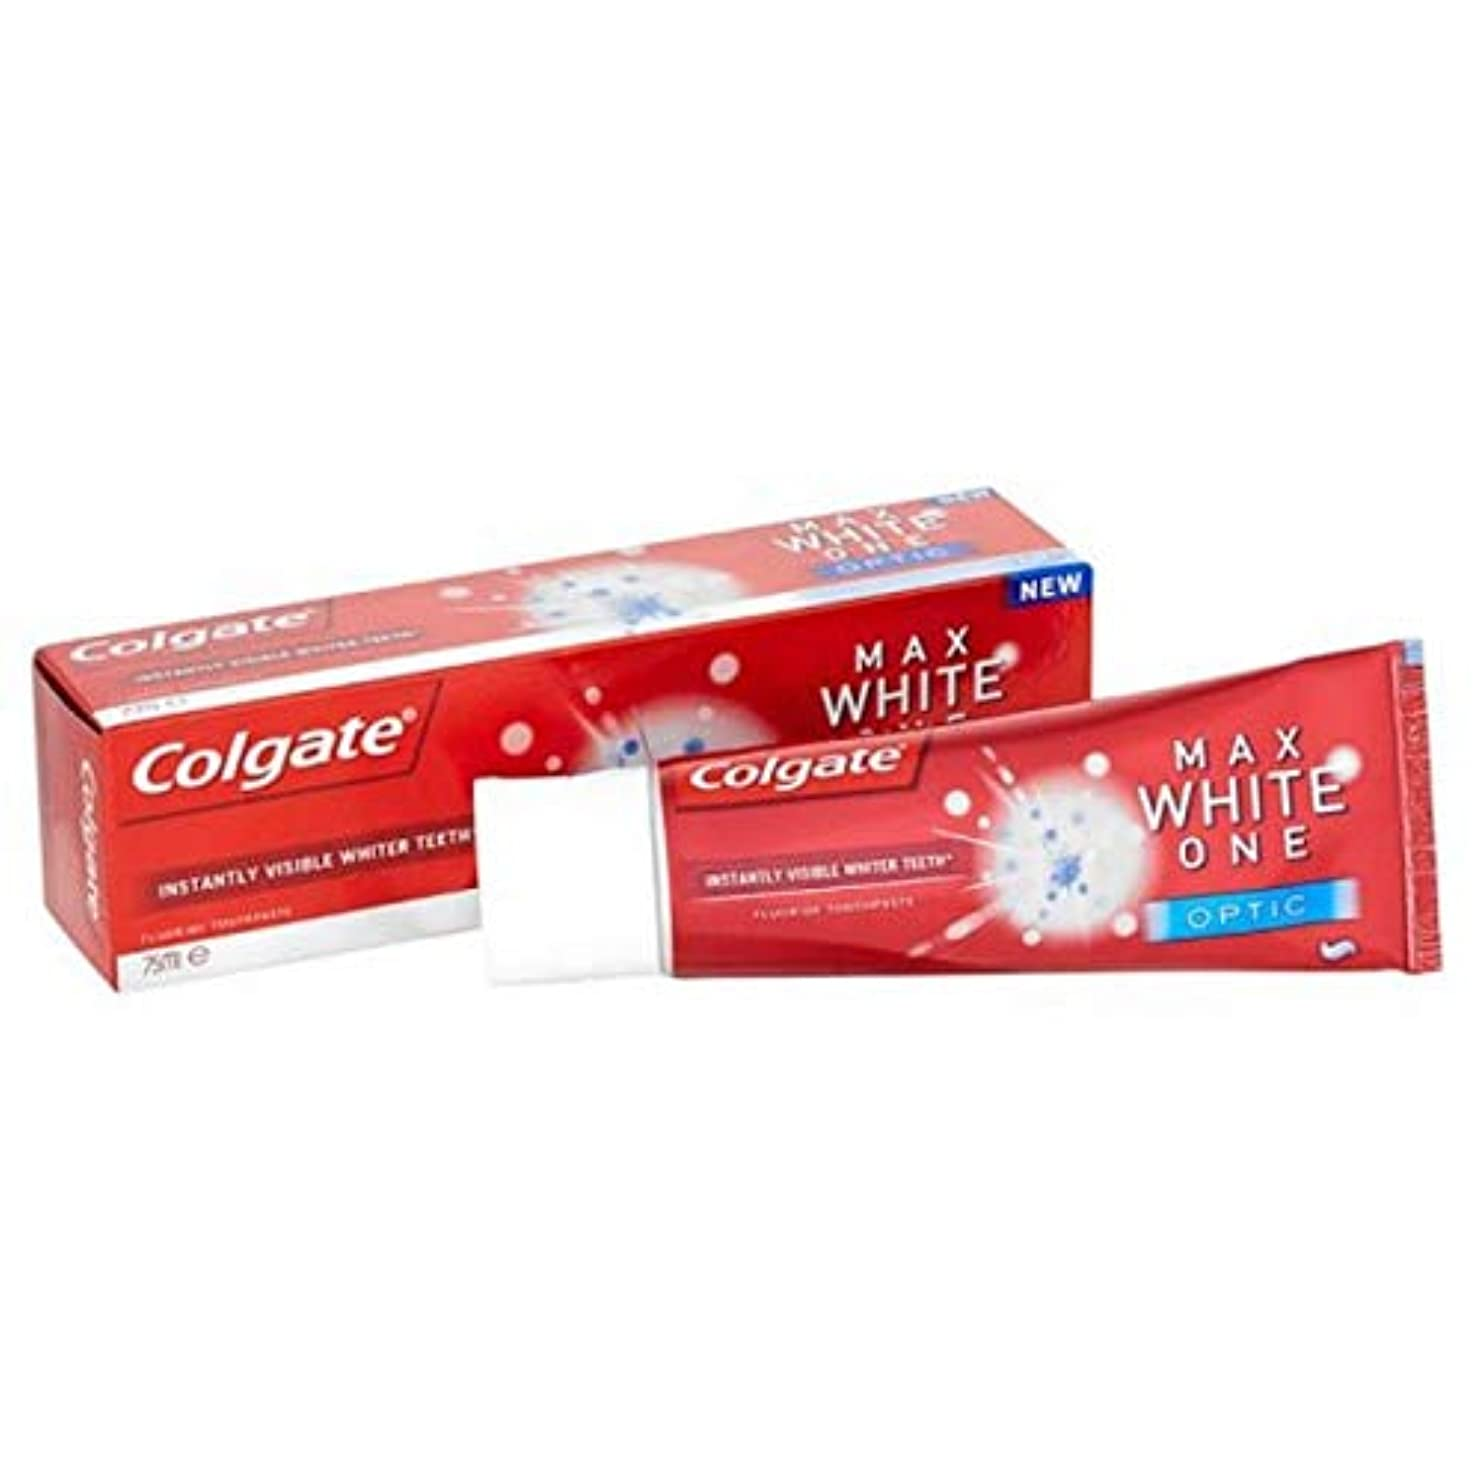 [Colgate ] コルゲート最大白1つの光学歯磨き粉25ミリリットル - Colgate Max White One Optic Toothpaste 25ml [並行輸入品]